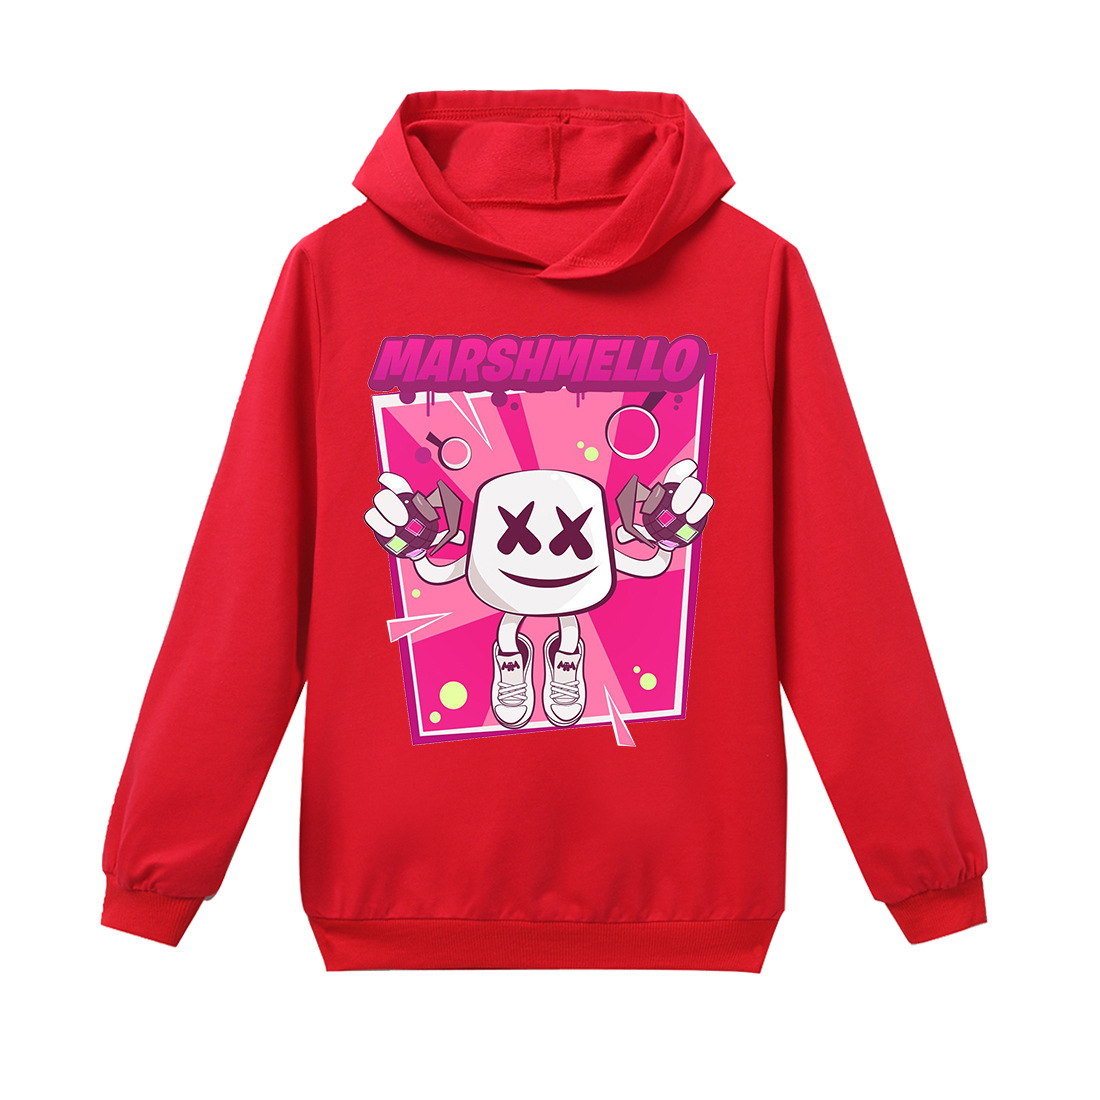 Roblox Kids Baby Boys Girls T Shirt Marshmello Dj Music Long Sleeve Cotton Tops Shirt Children Spring Autumn Clothes 6 14 A432